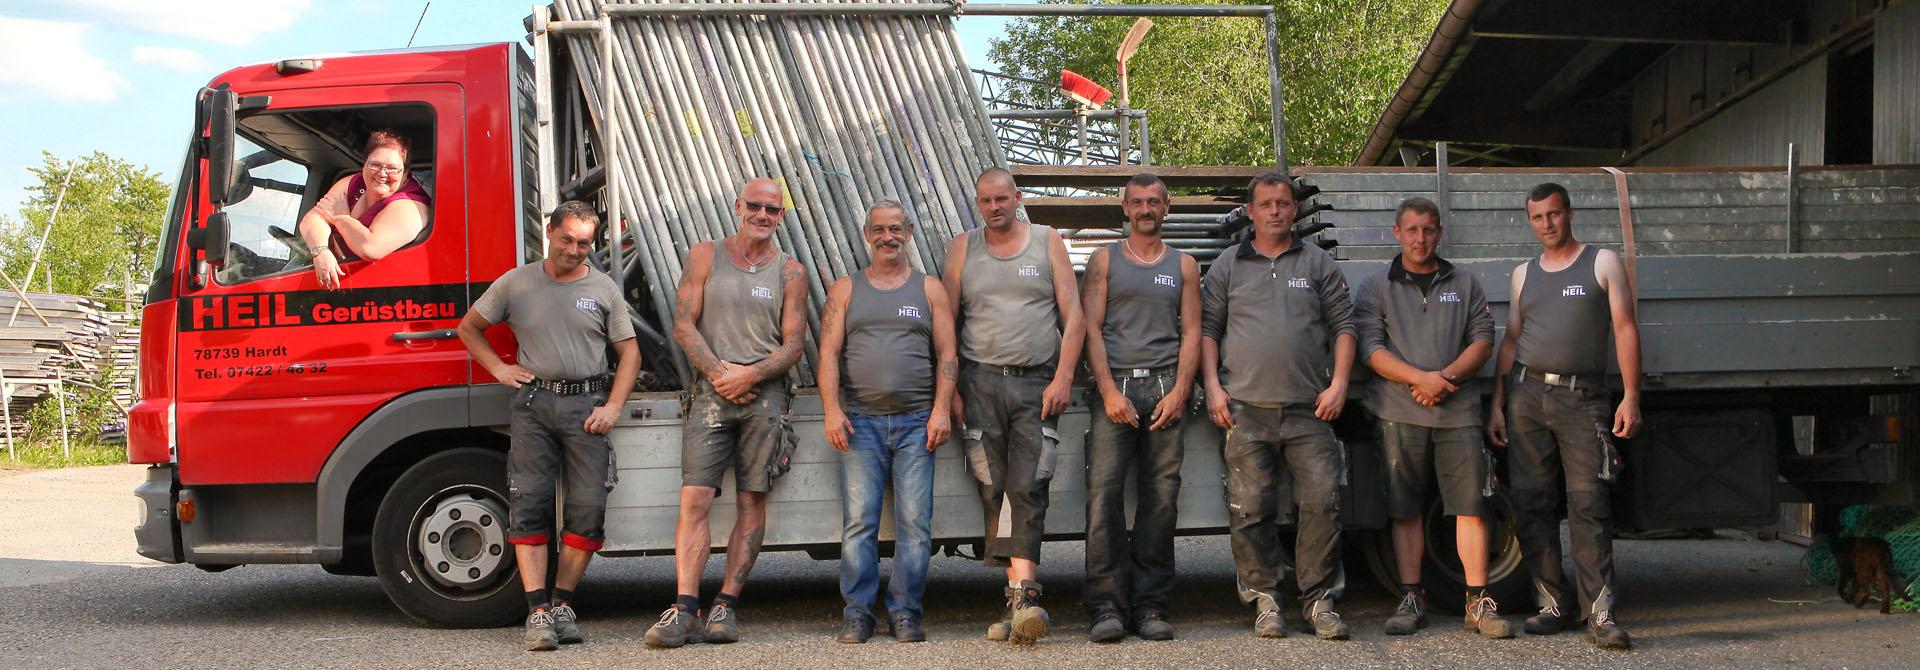 Heil-Gerüstbau Teamfoto